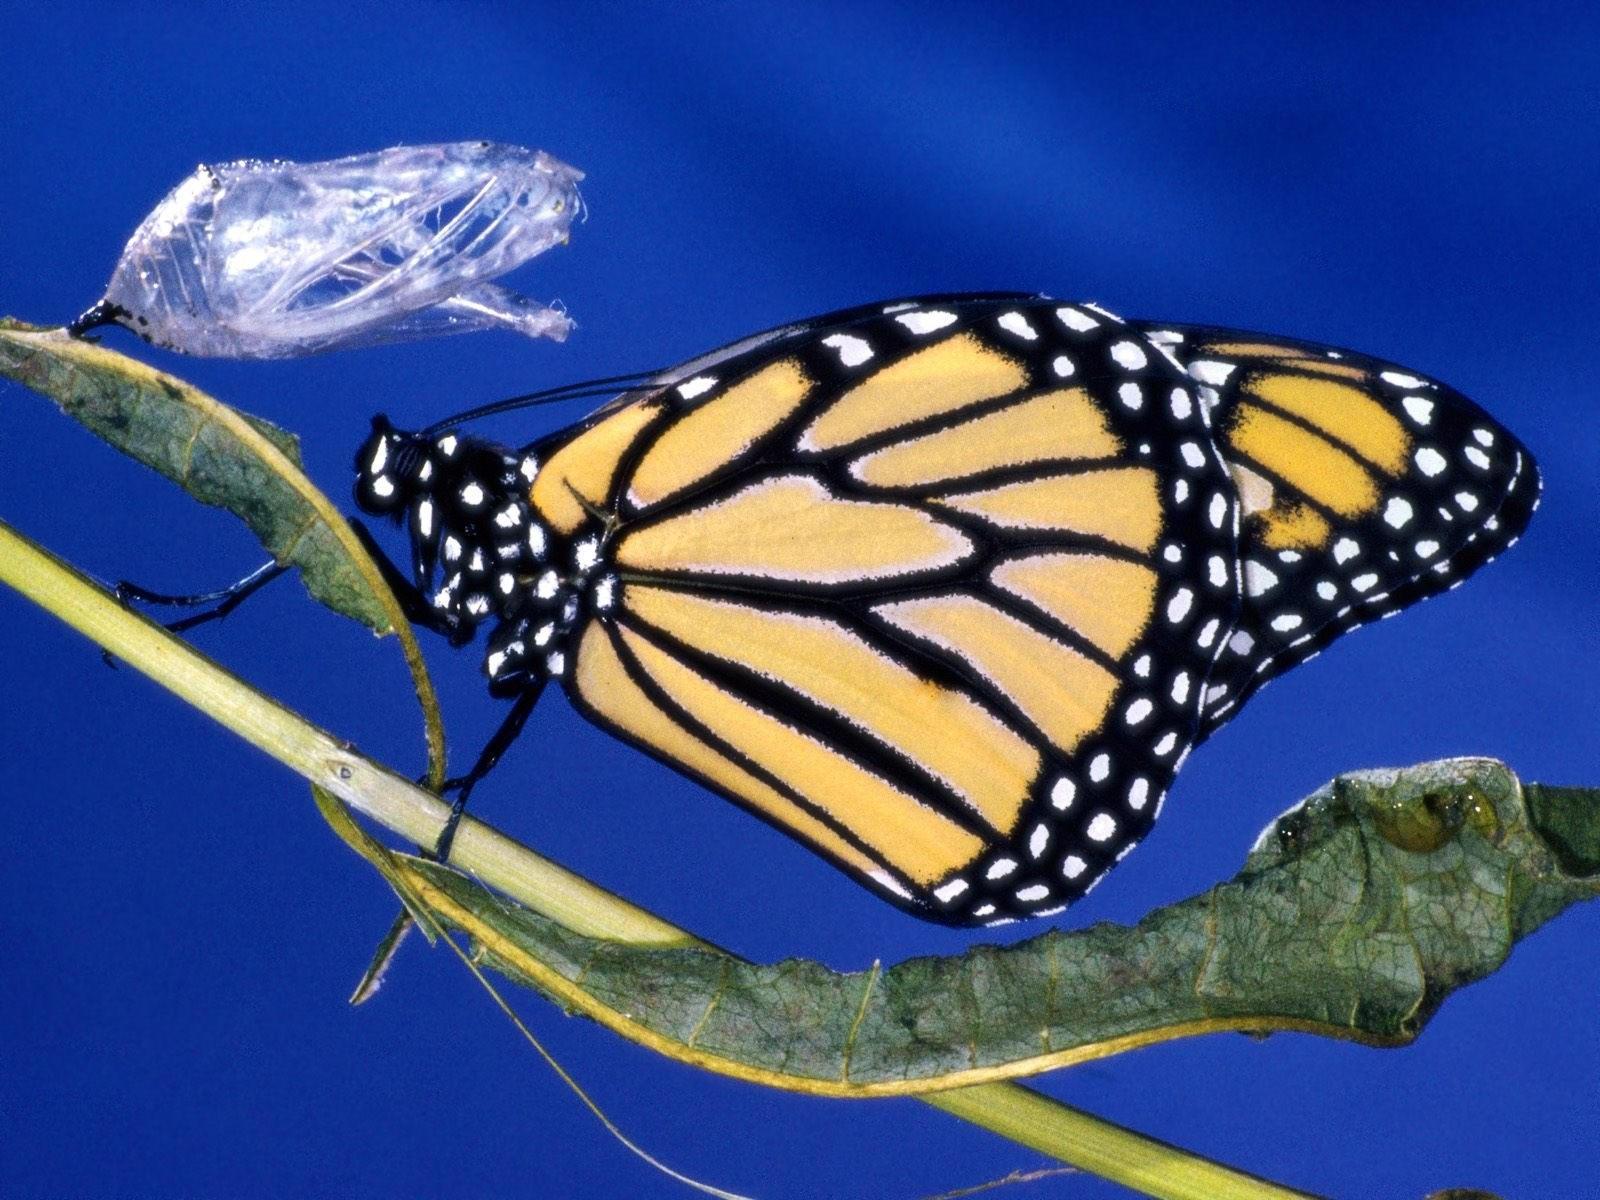 Желто-черная бабочка на стебле